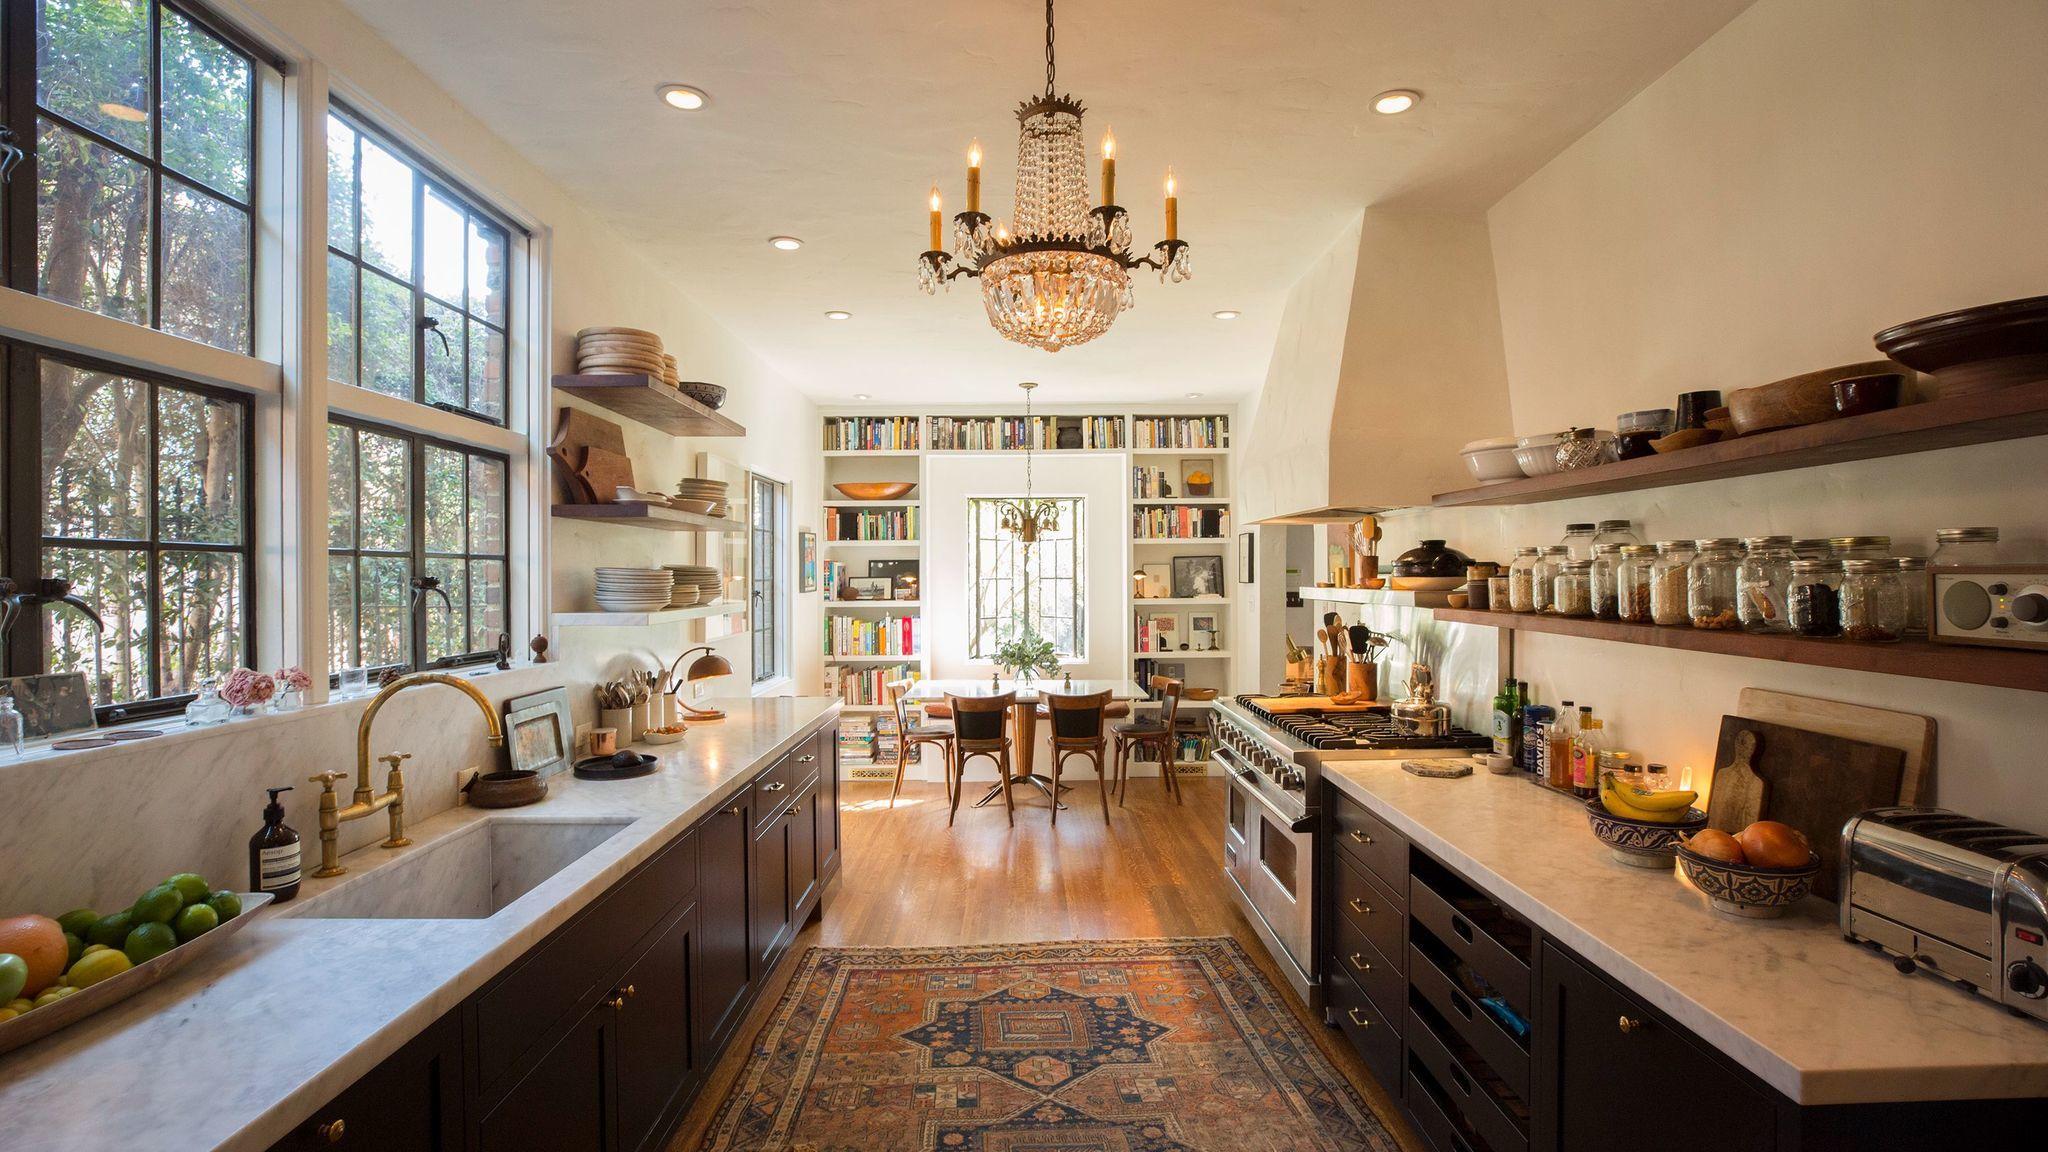 The kitchen in actor Walton Goggins' Los Angeles house.